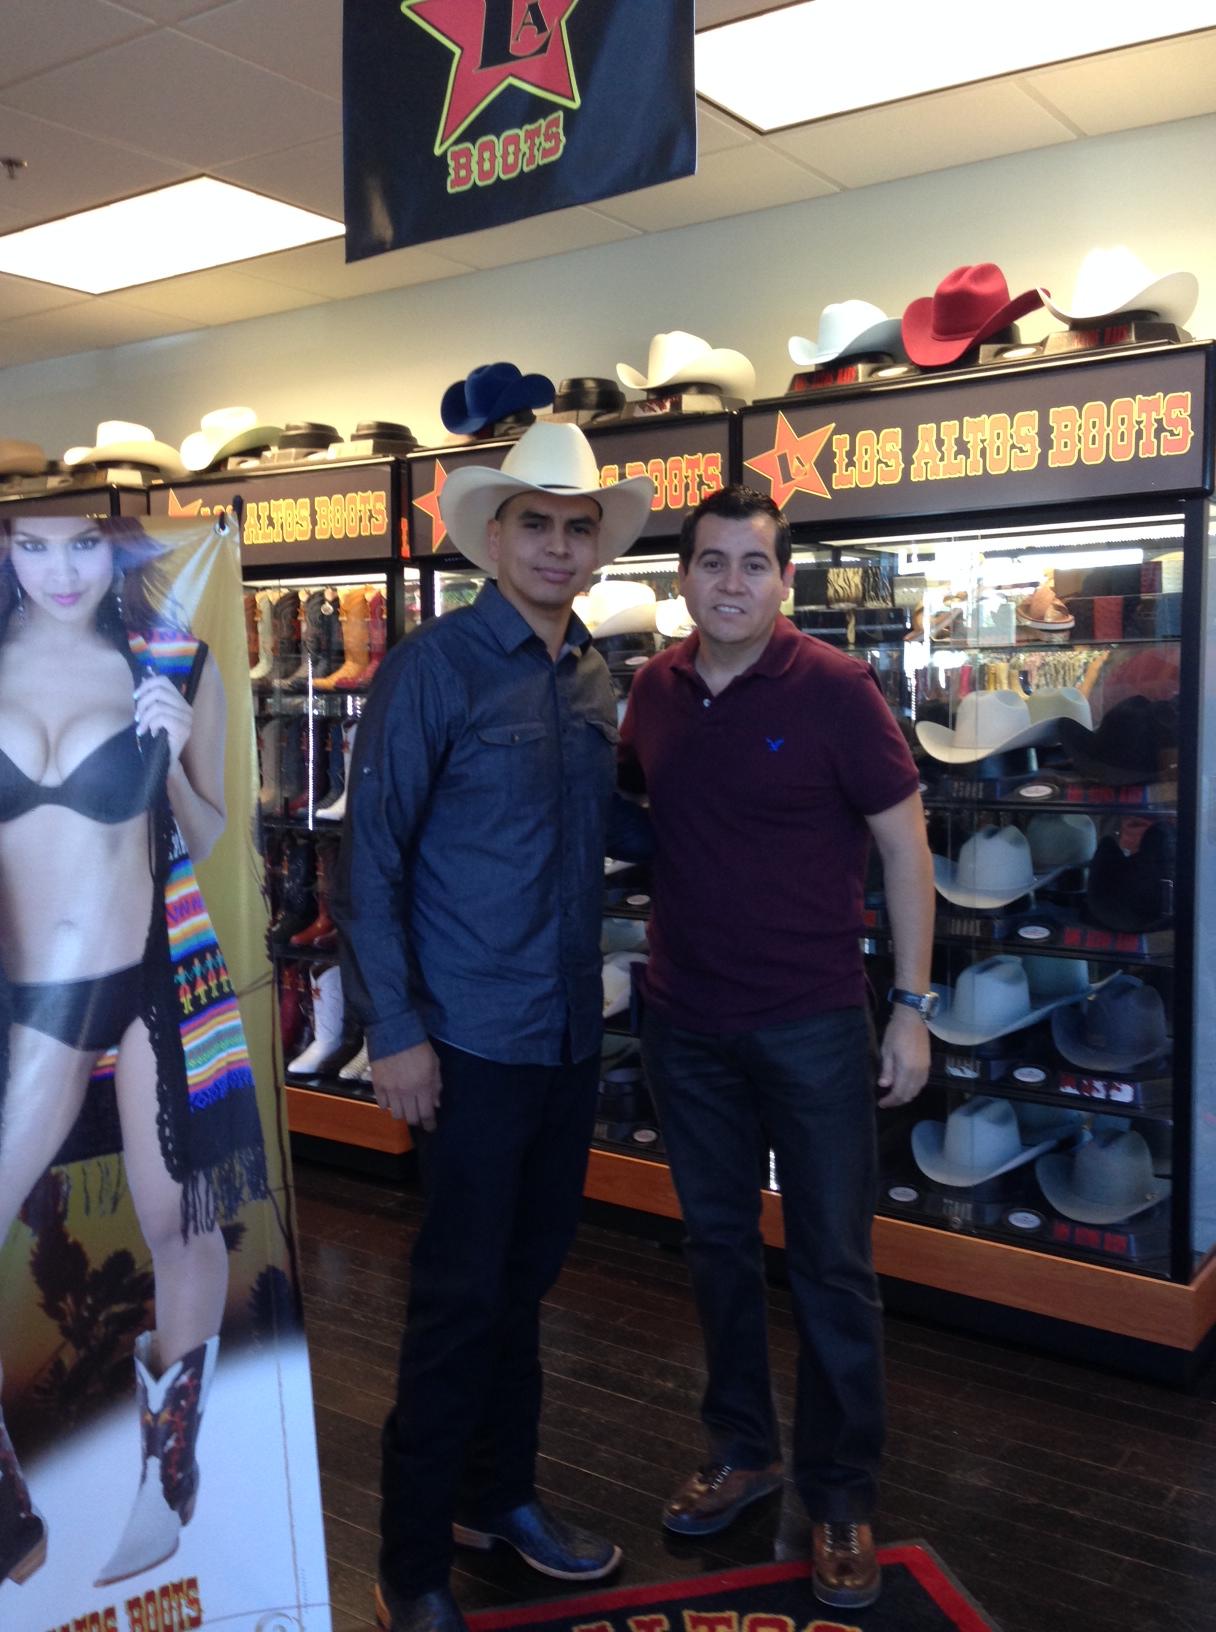 e08d0cf8989 los altos boots owner | Yeehaw Cowboy Boots & Western Wear Blog